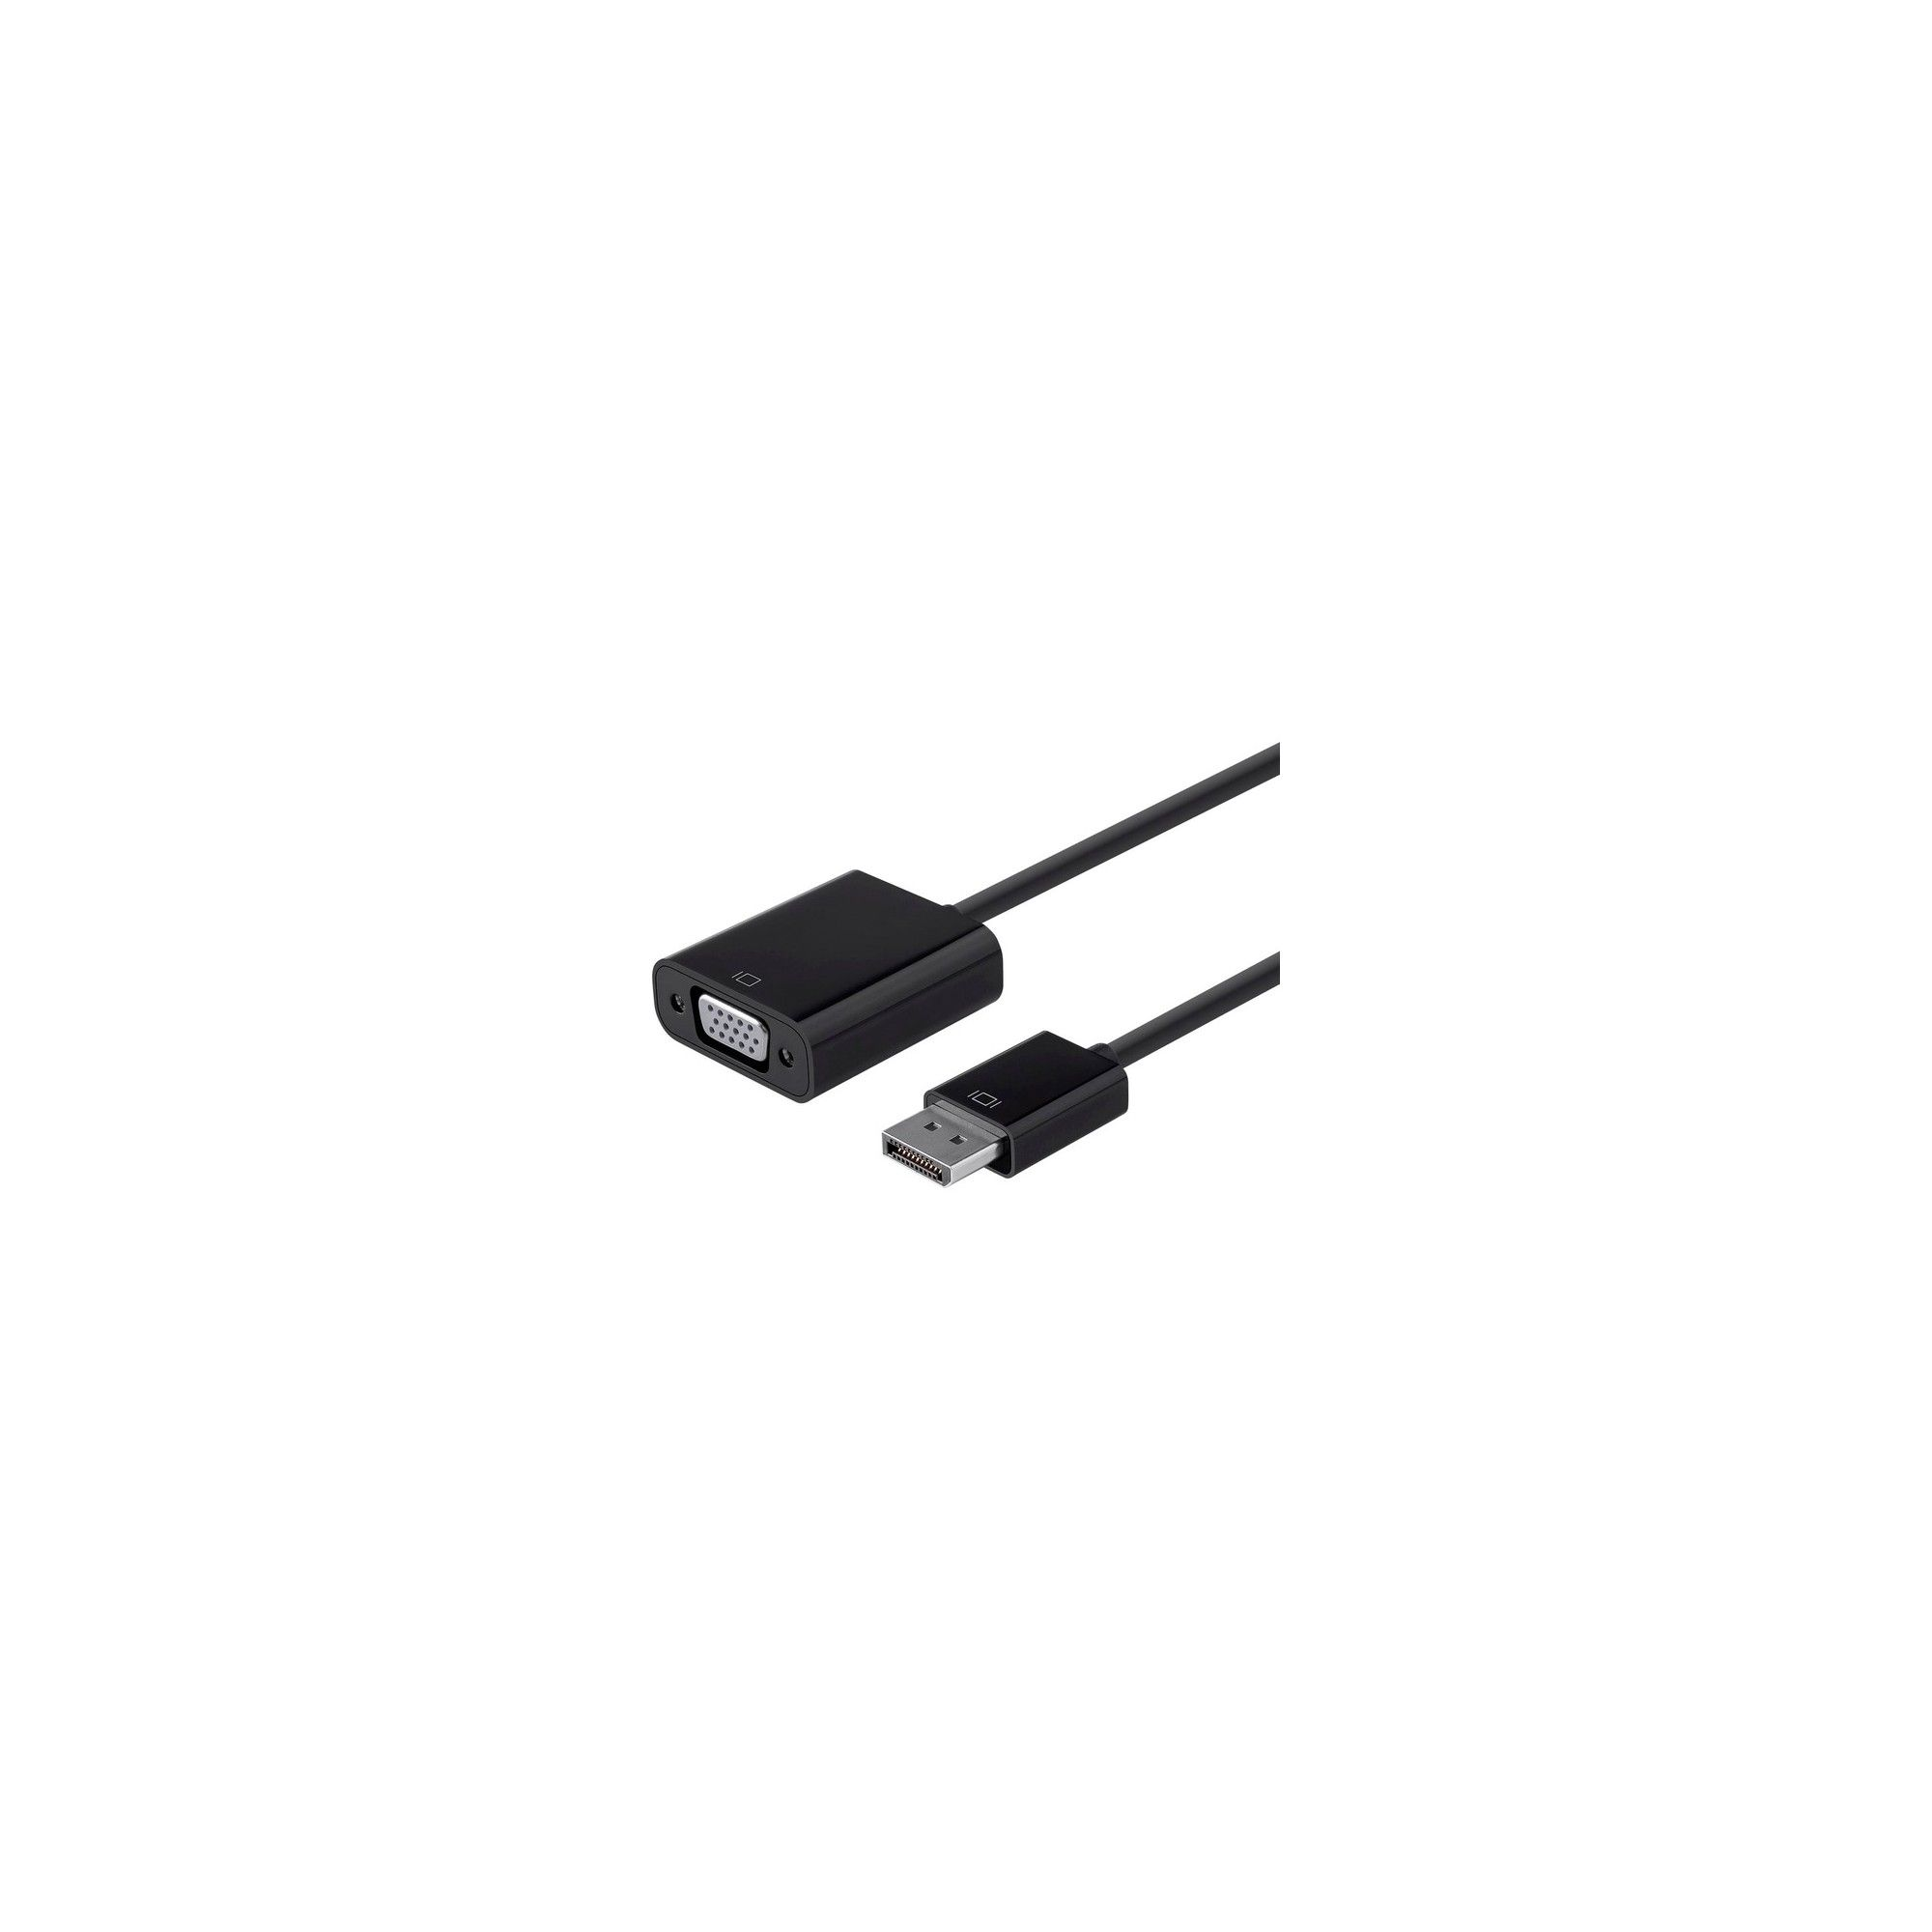 Monoprice DisplayPort 1 2a to Vga Active Adapter, Black